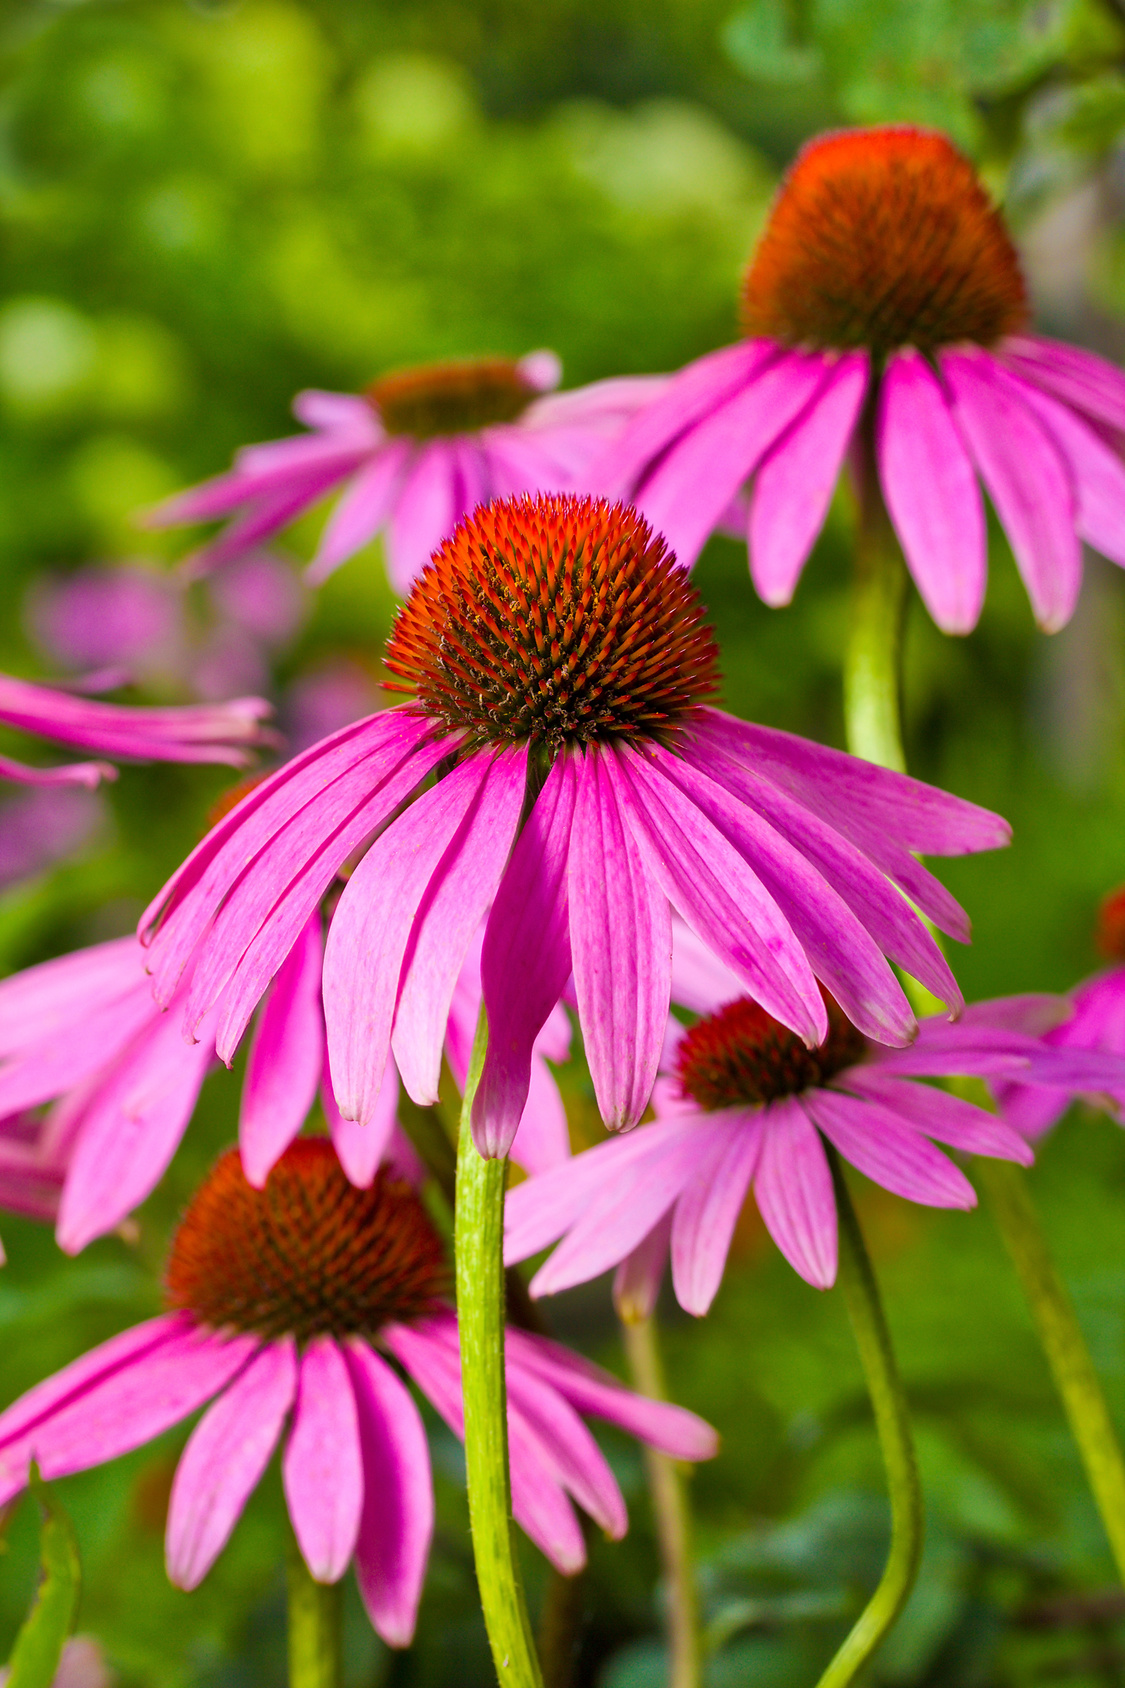 sonnenhut - echinacea_angustifilia